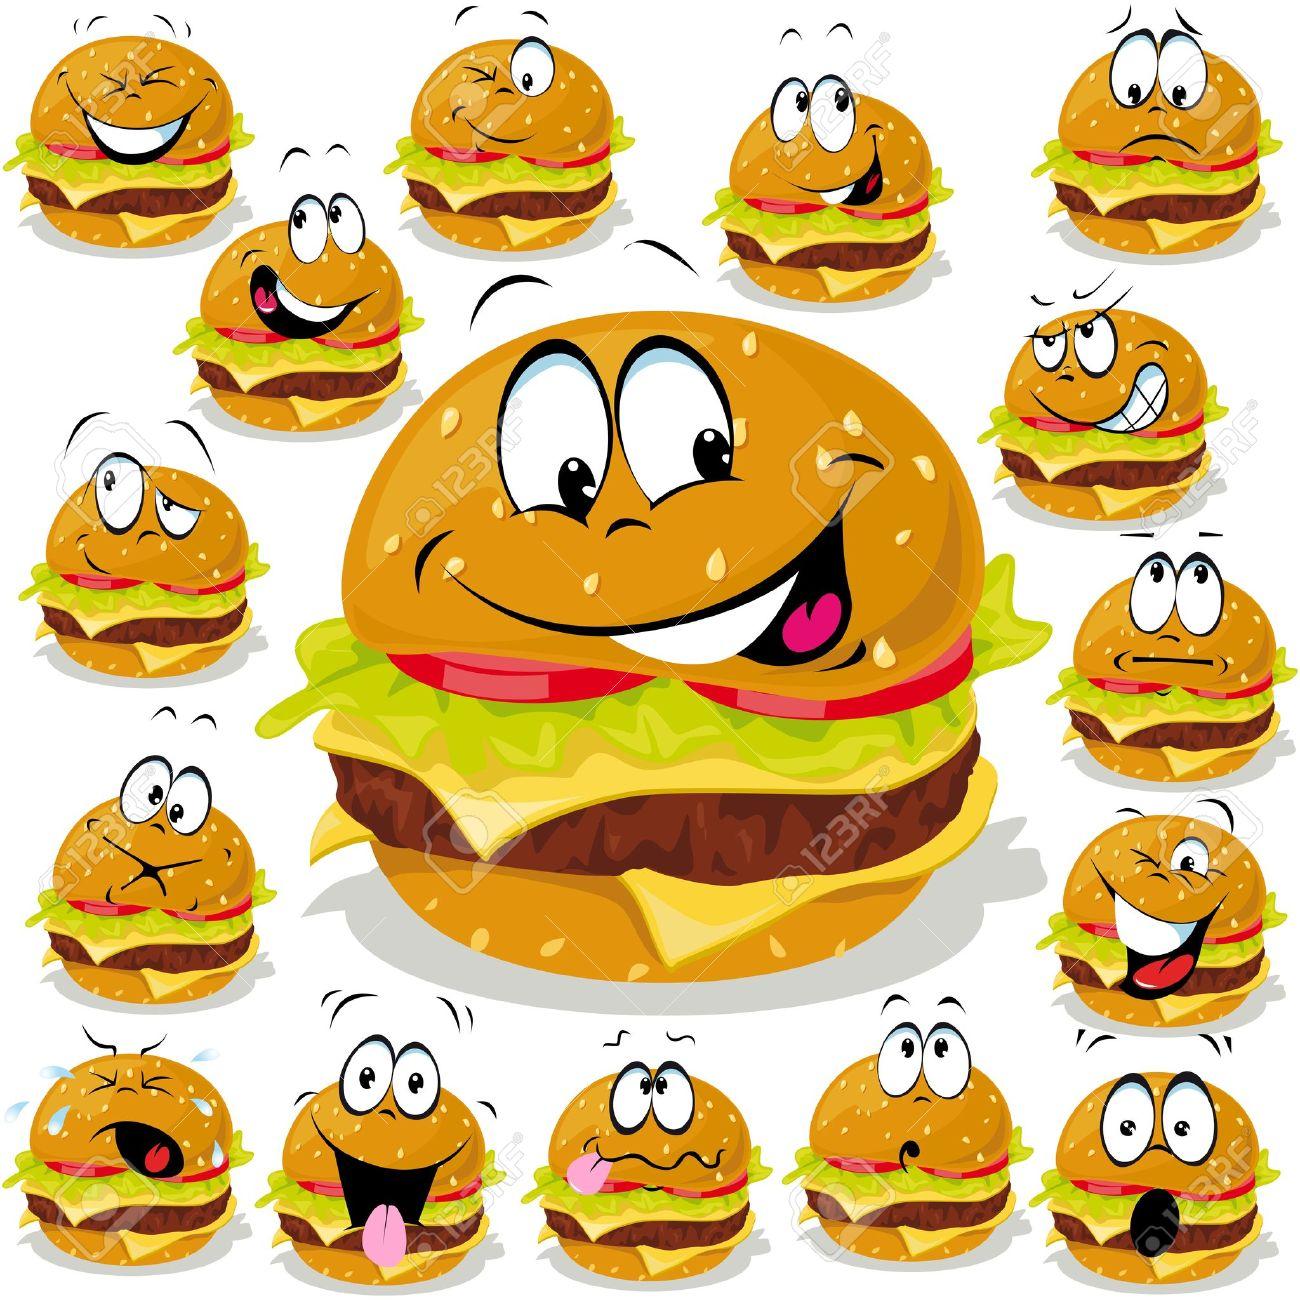 hamburger cartoon illustration with many expressions Stock Vector - 15171991